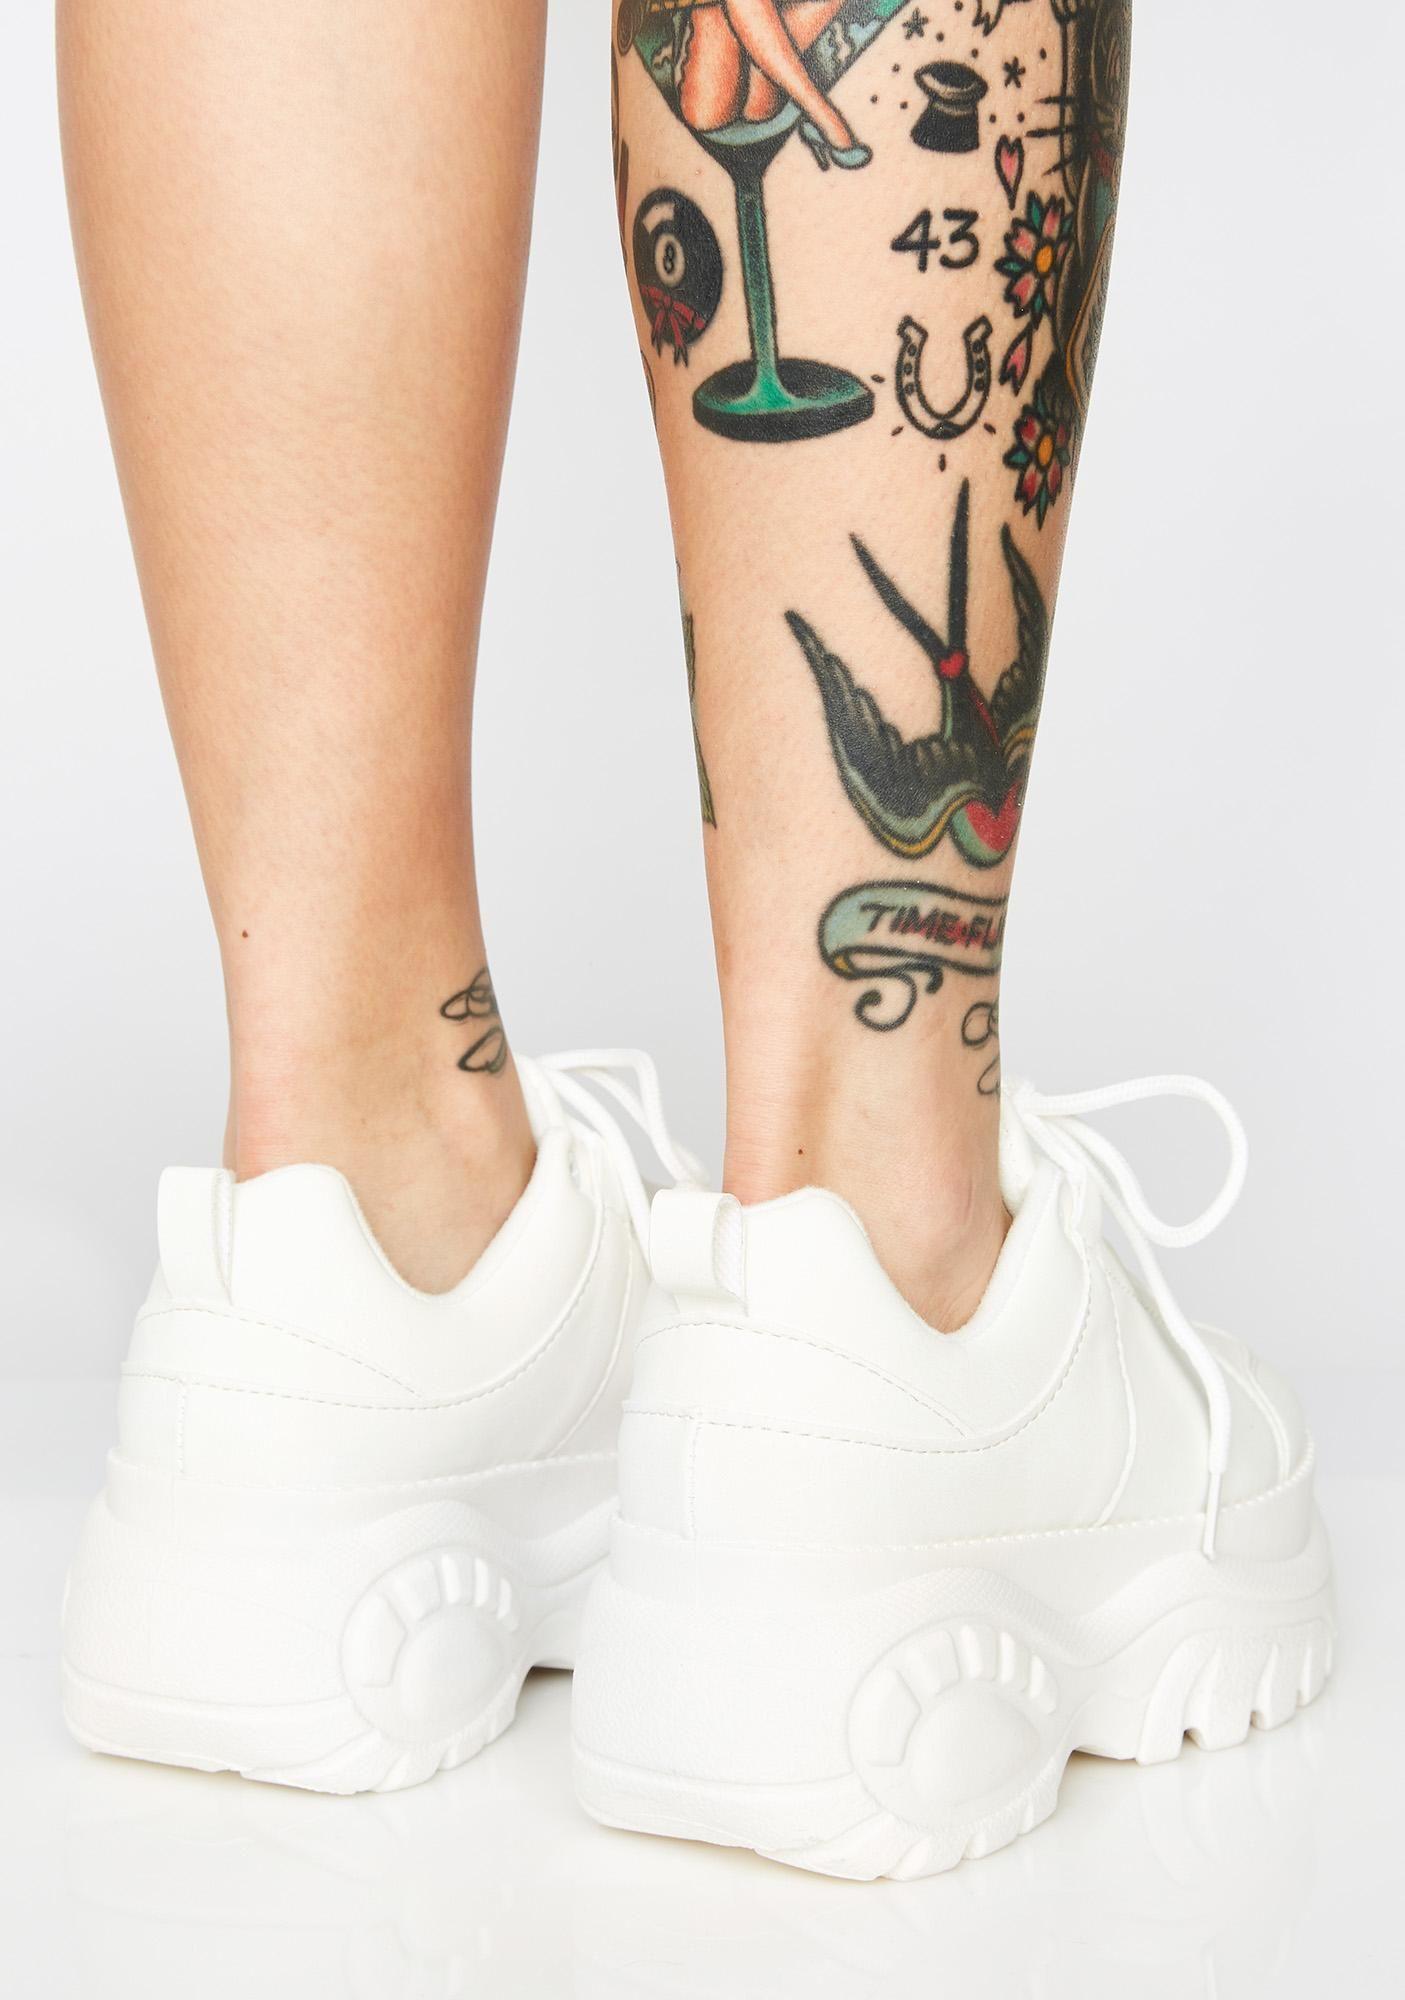 Platform sneakers, Creeper boots